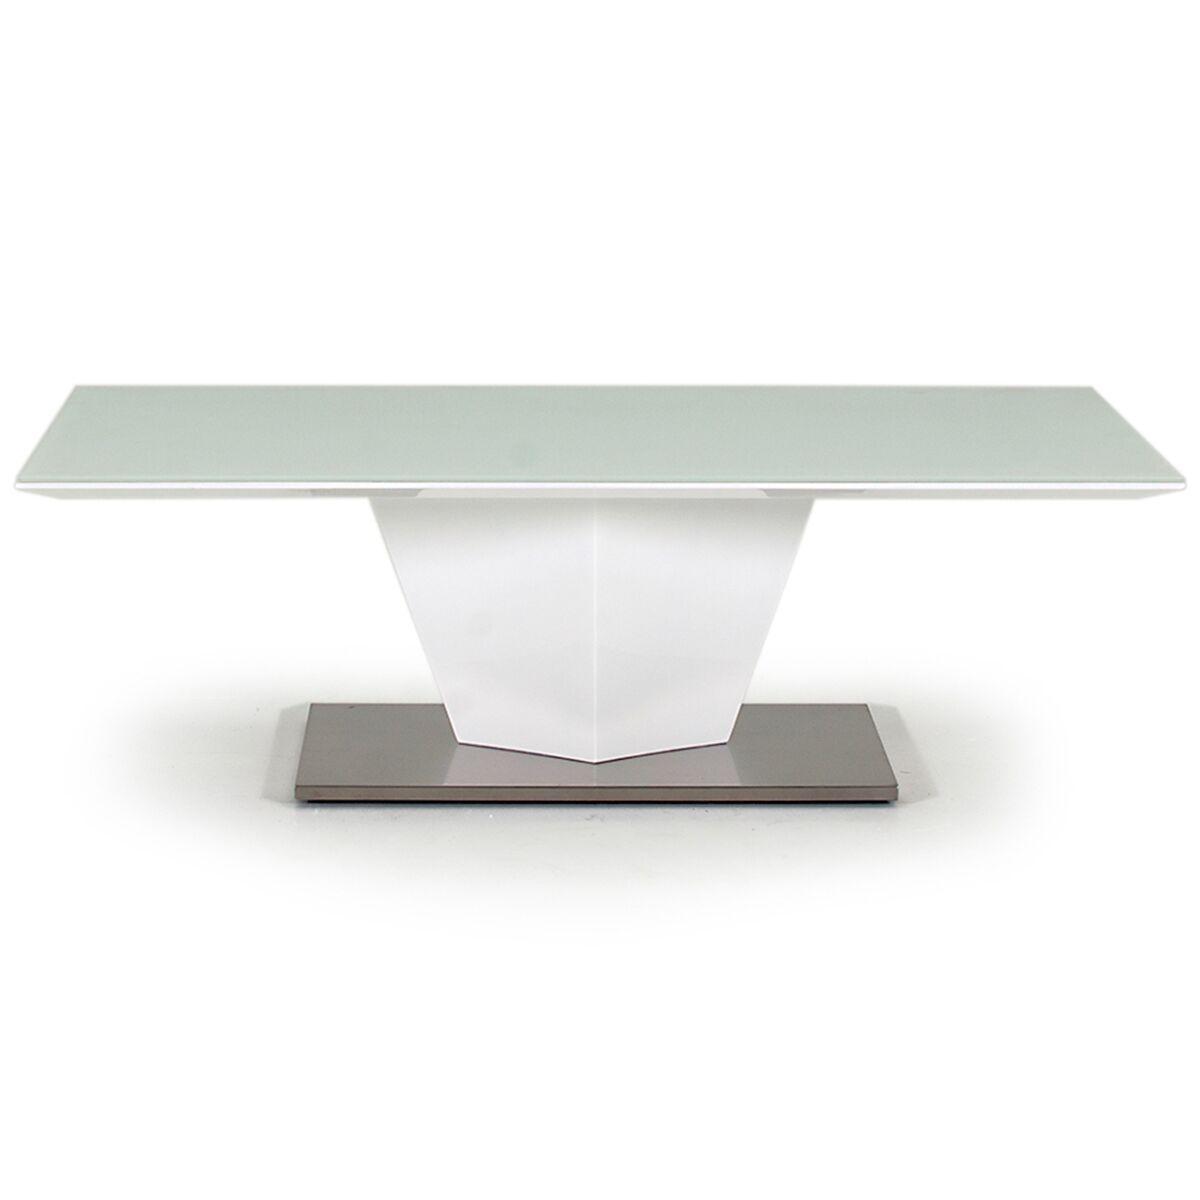 essence coffee table white high gloss glass